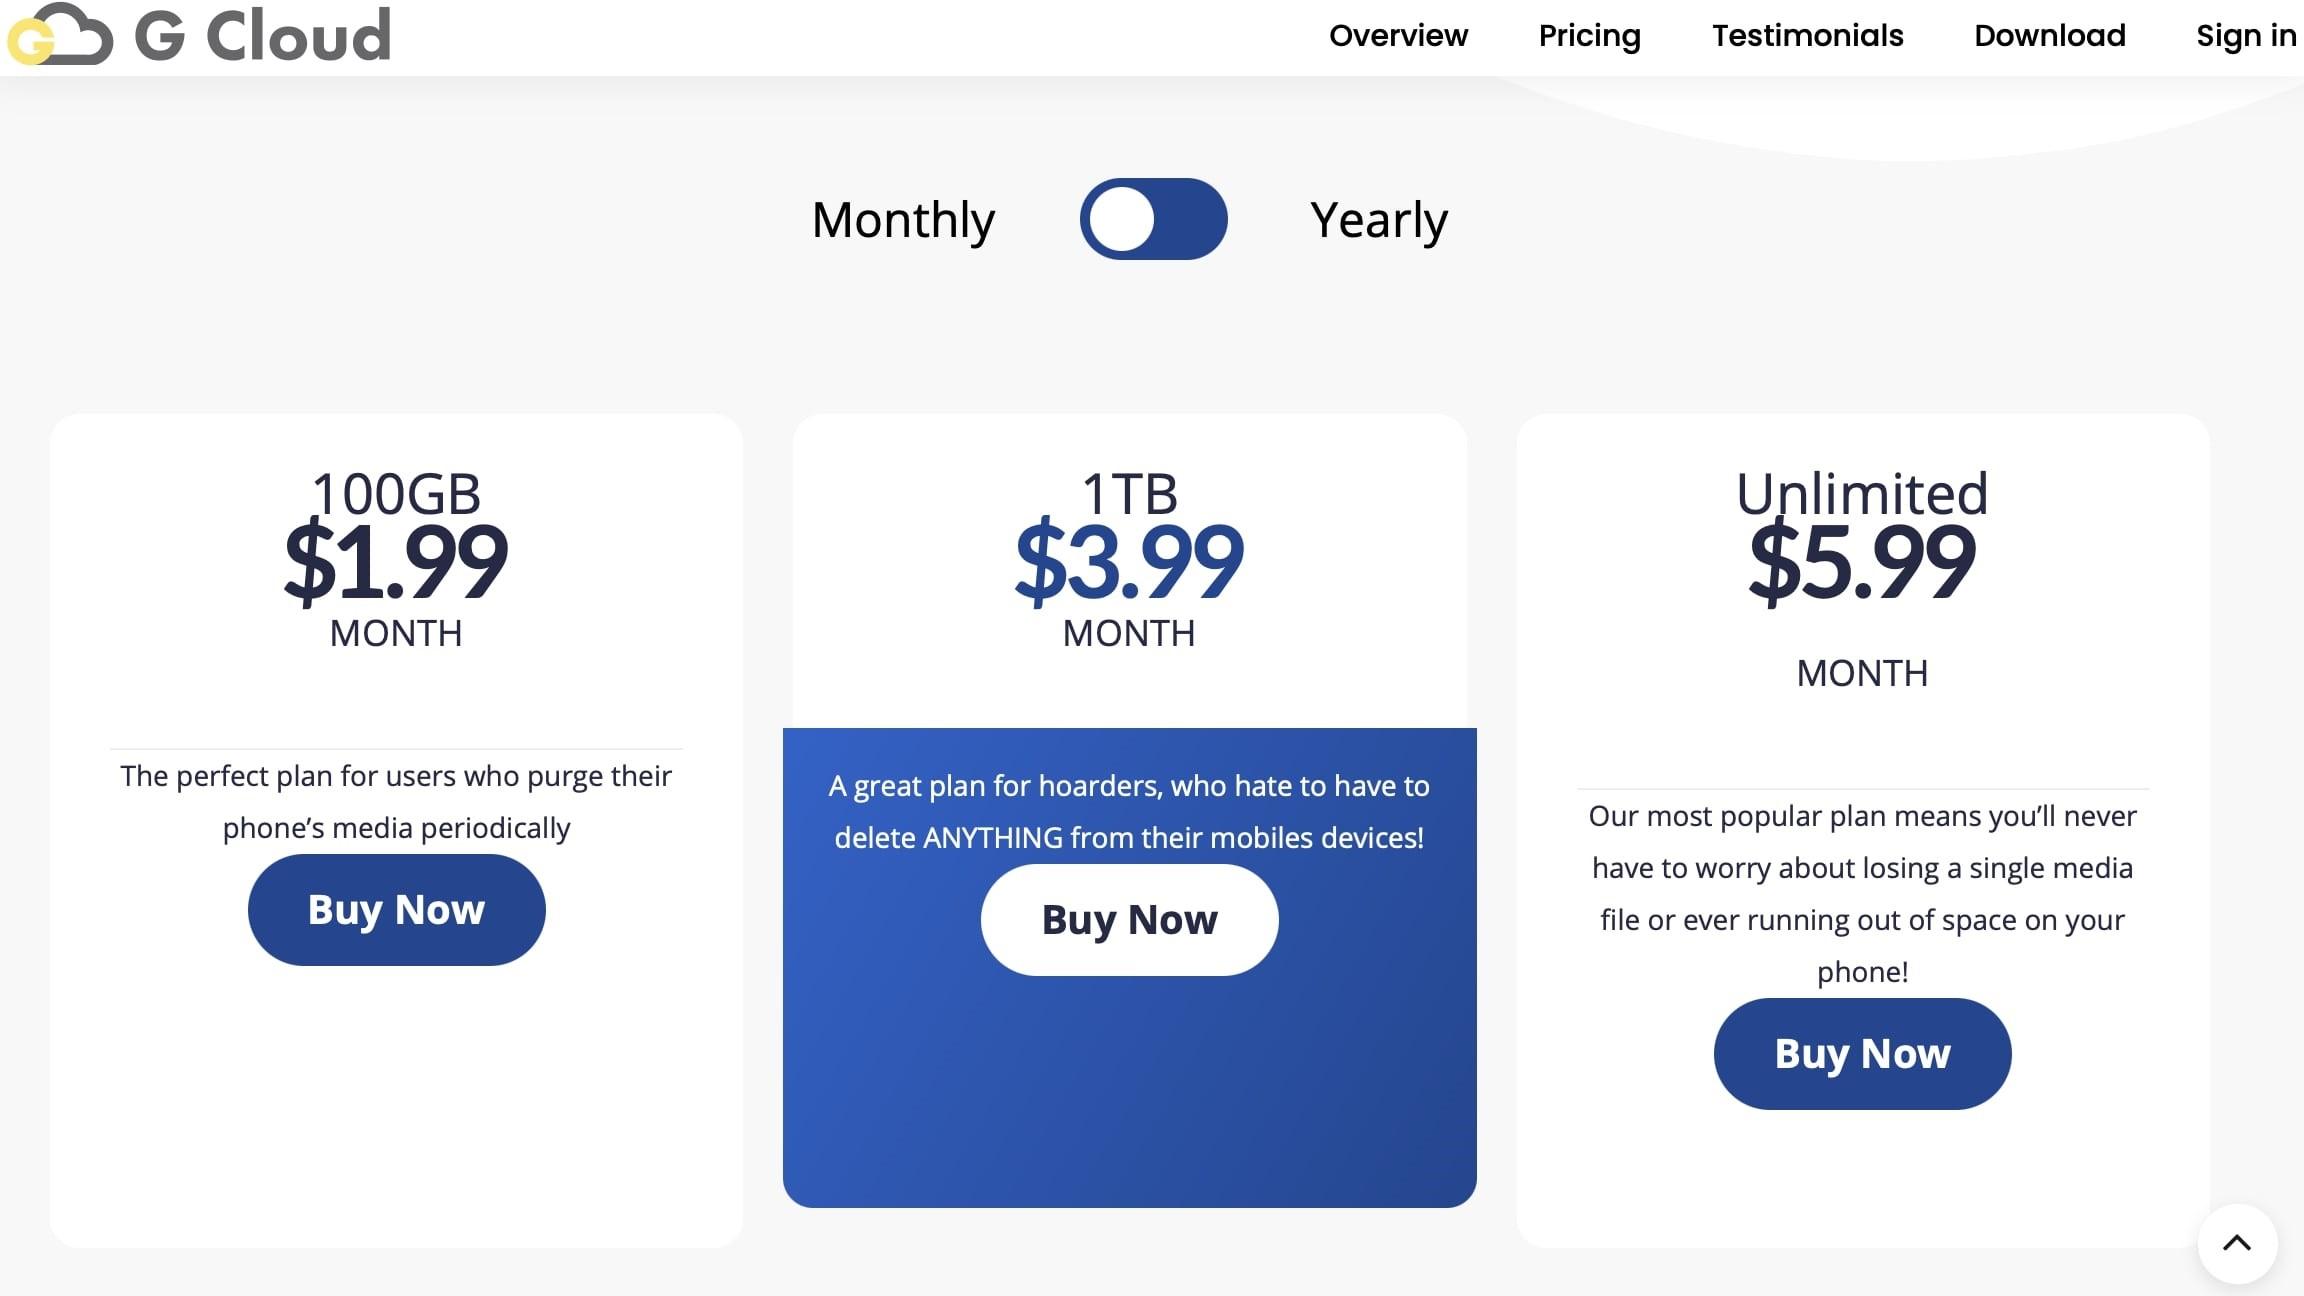 G Cloud Pricing